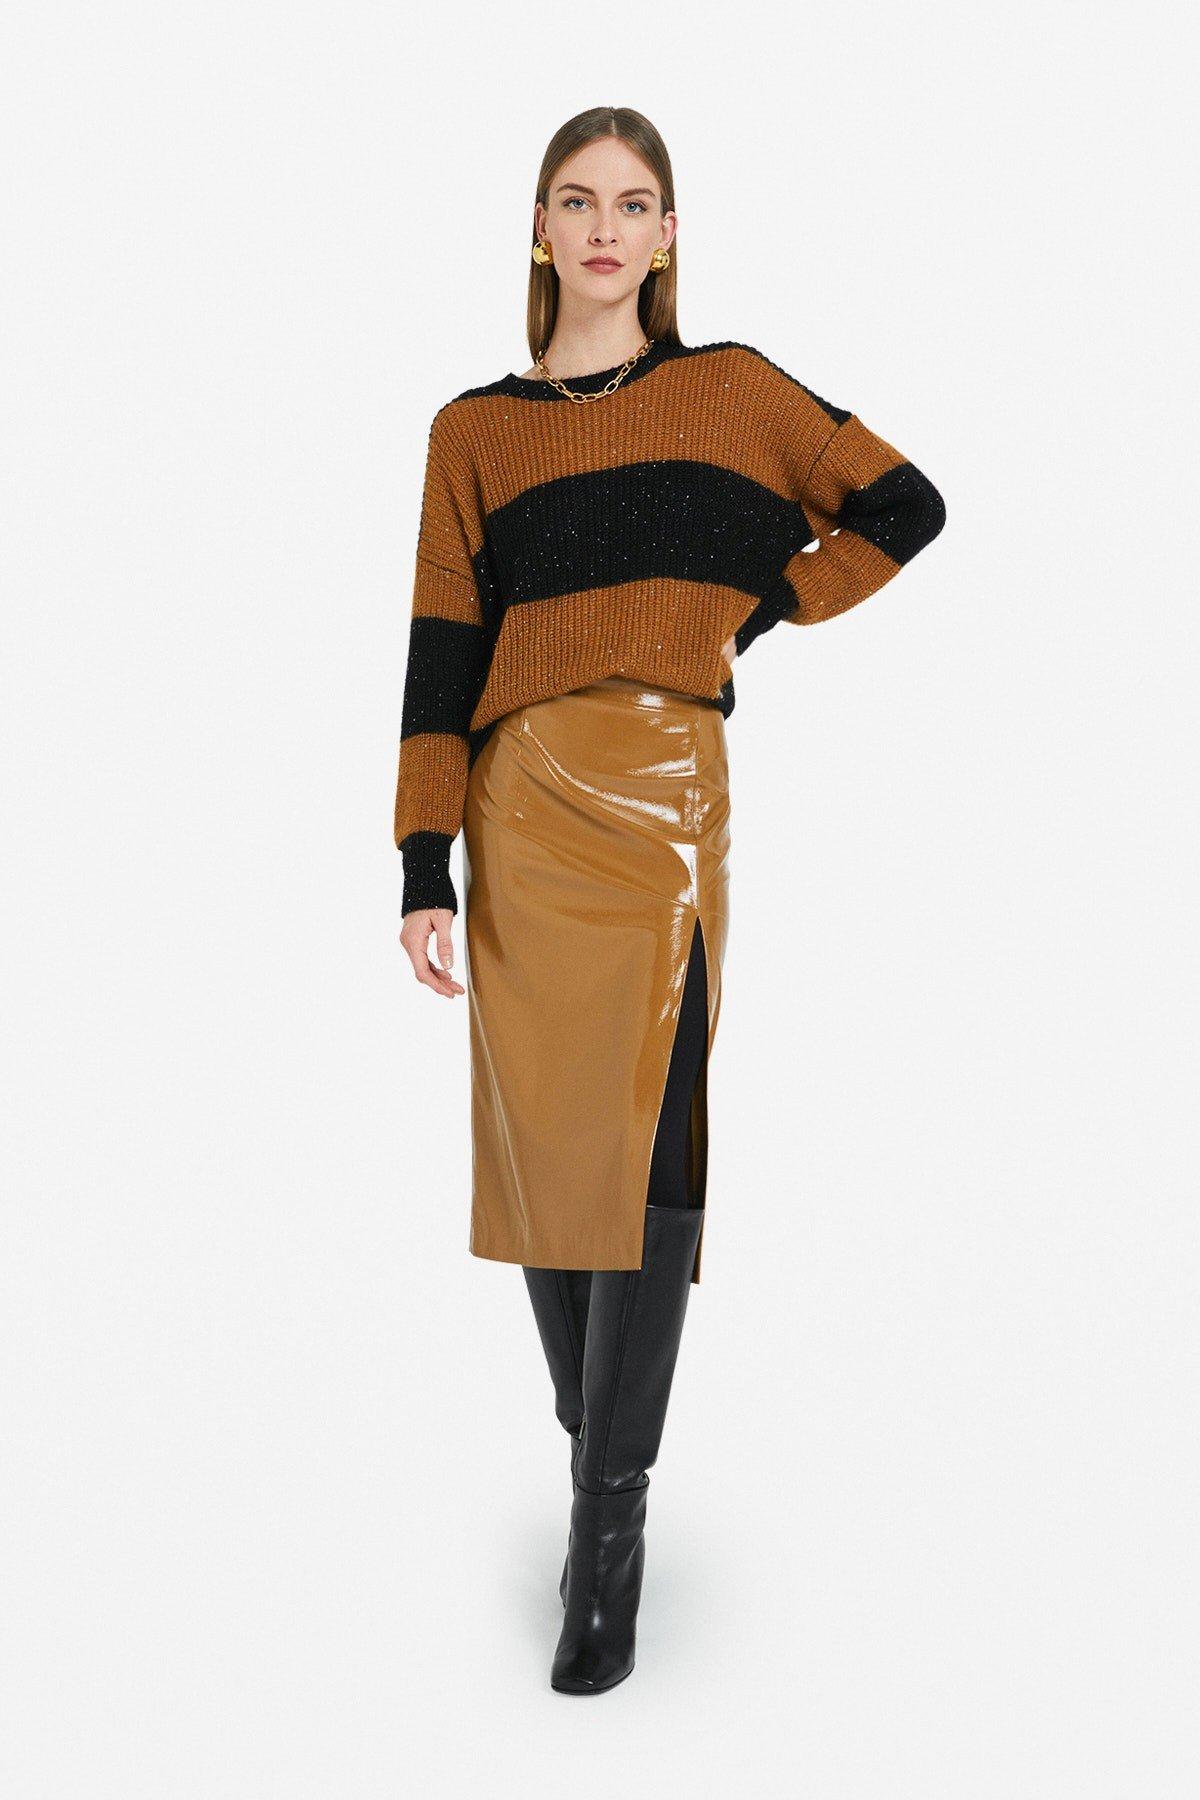 Patent leather midi skirt